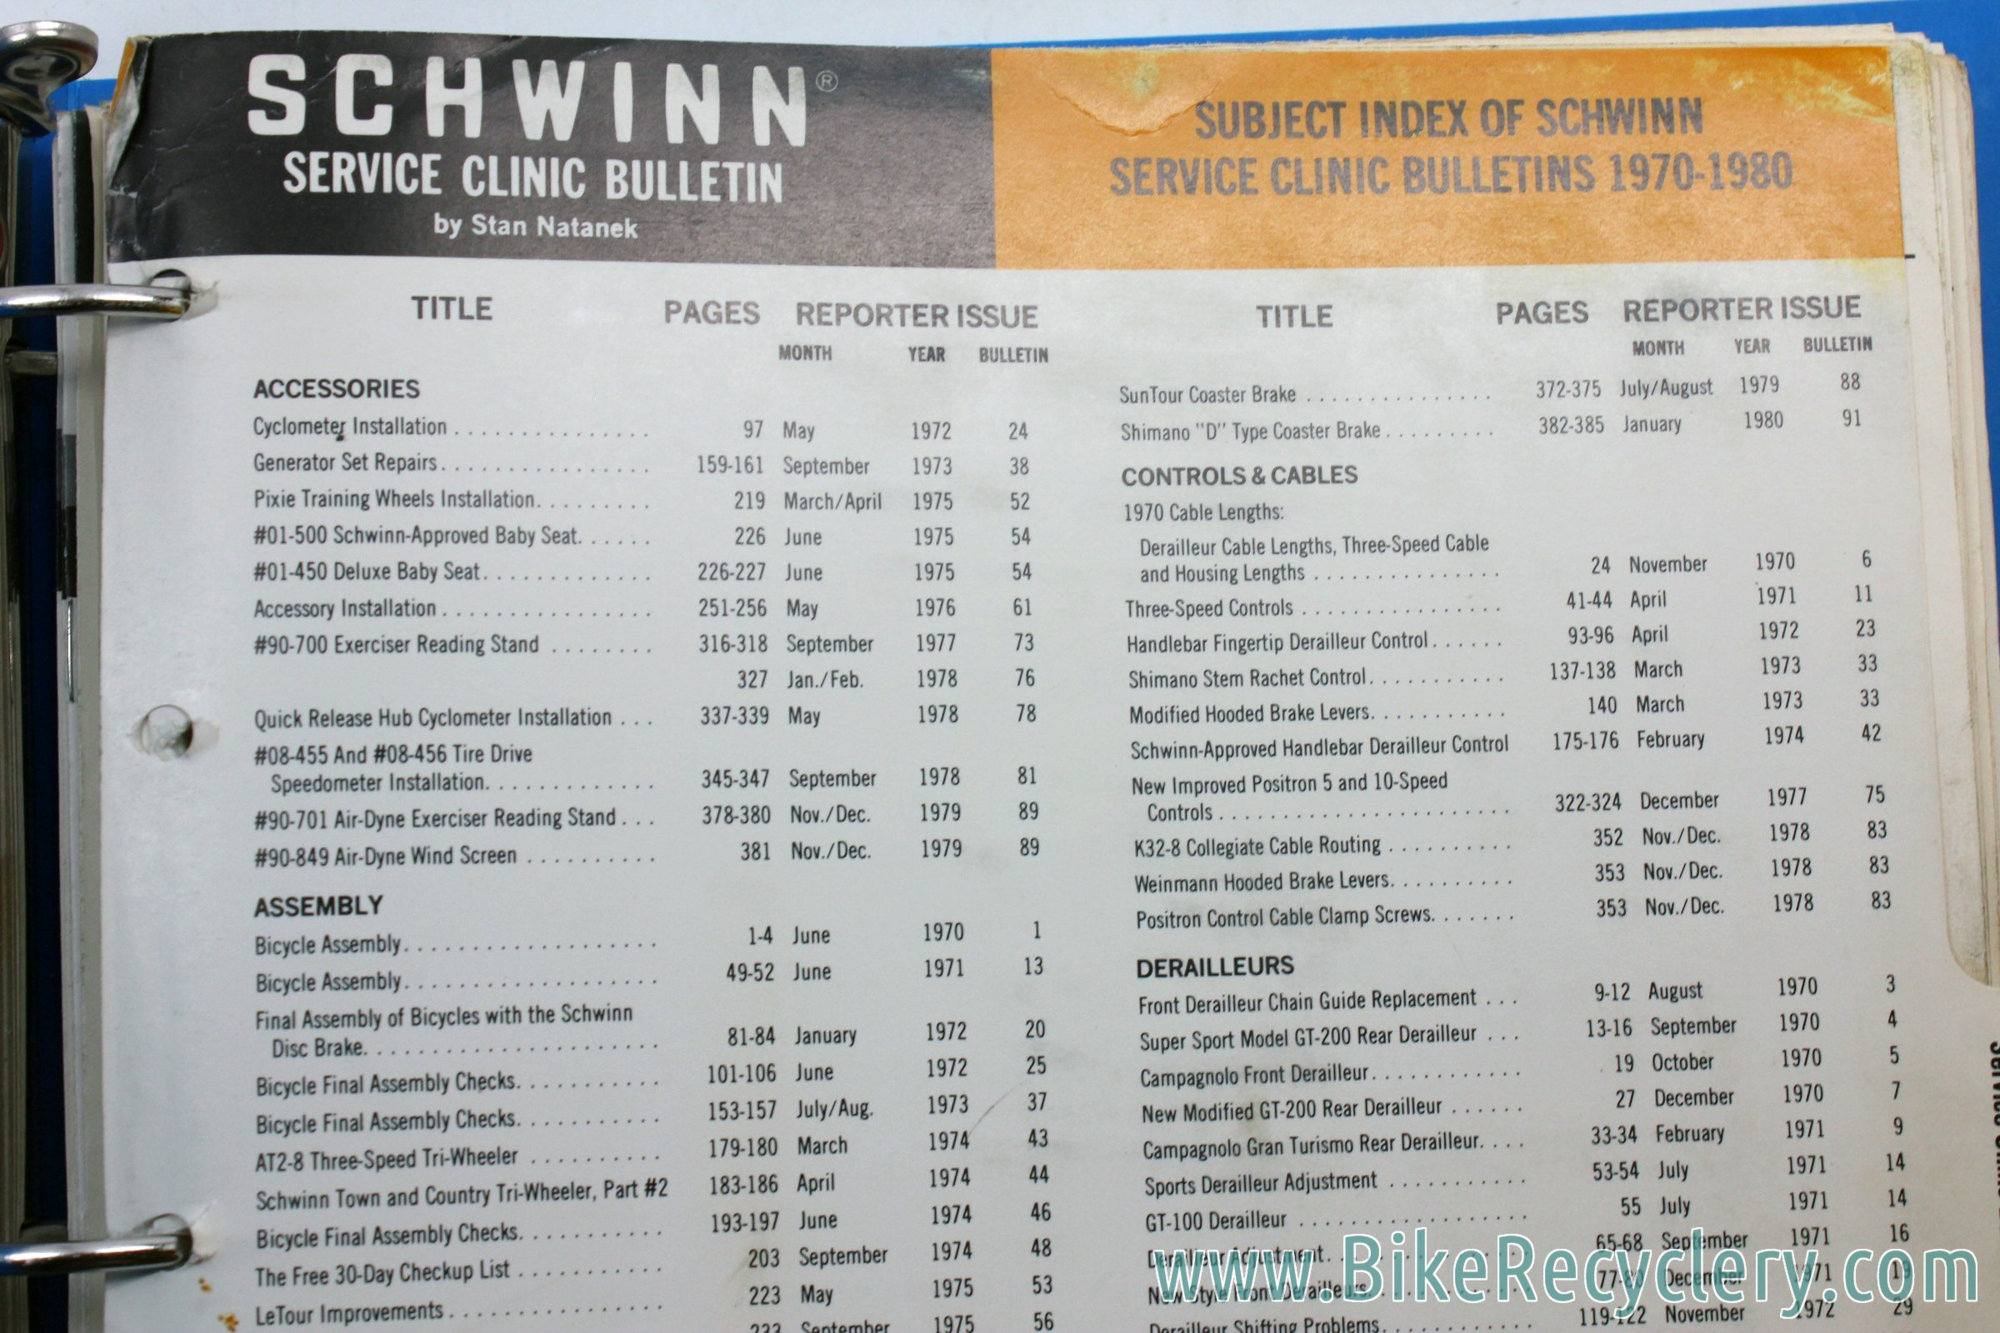 vintage_schwinn_memorabilia_catalogs_dealer_service_manuals_17780.JPG